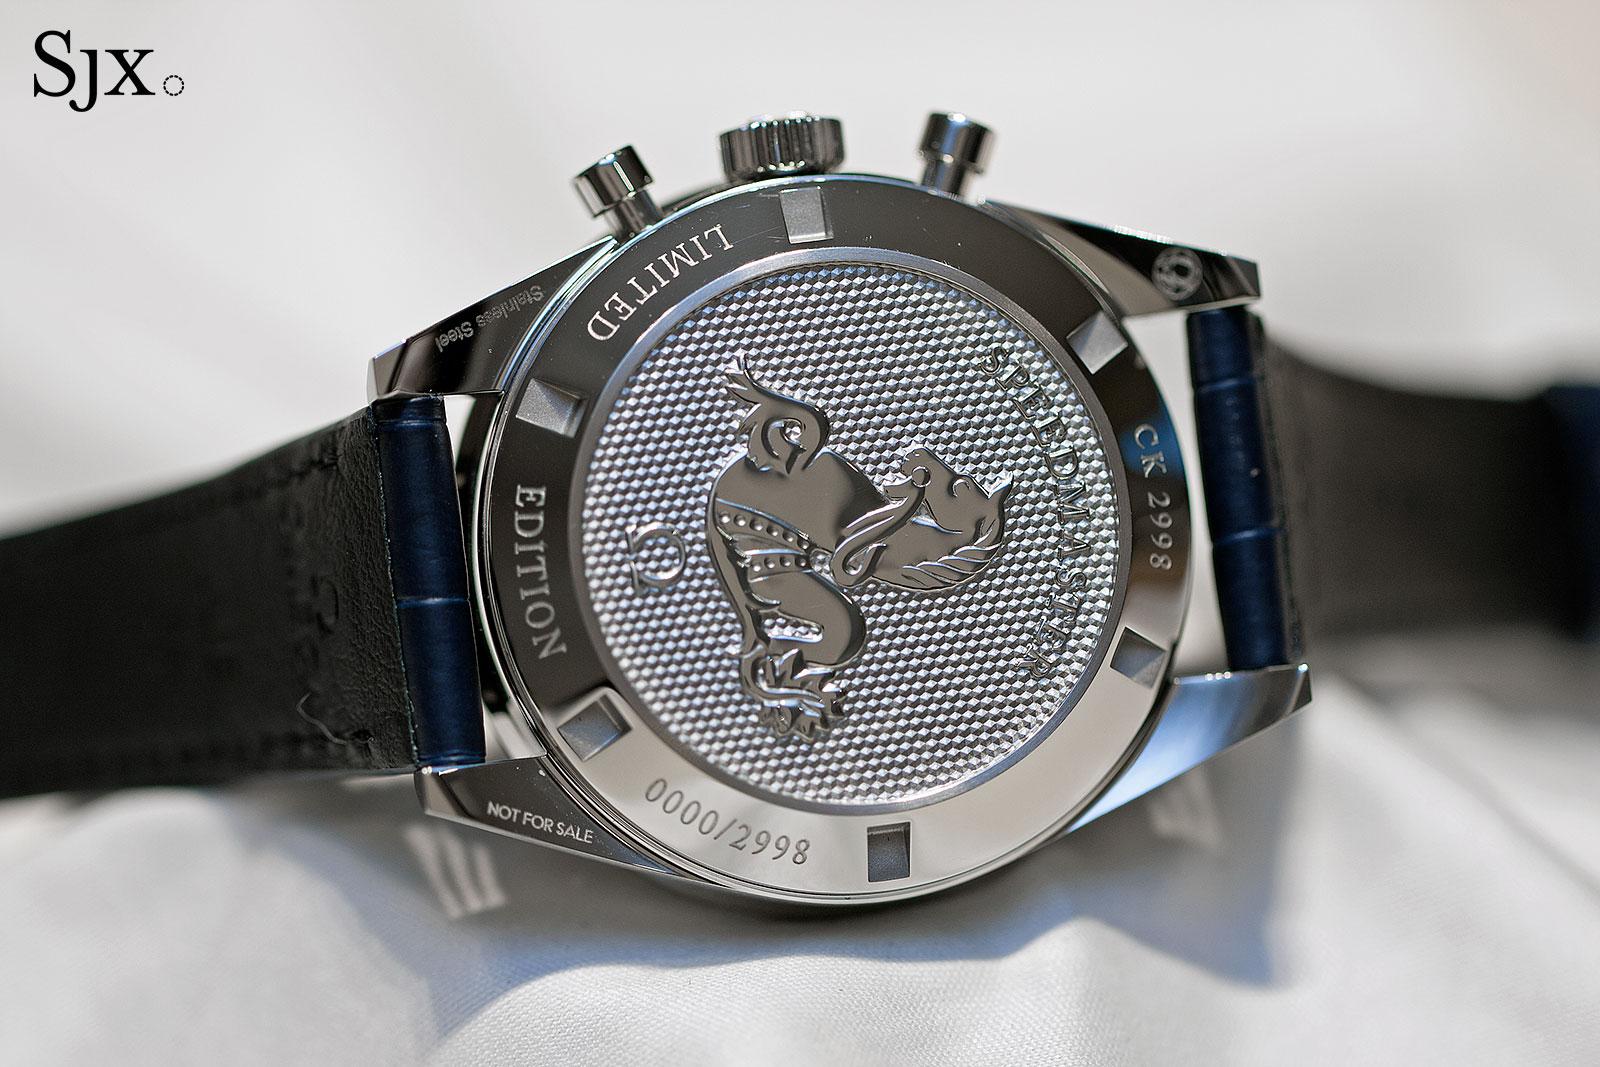 Omega Speedmaster Moonwatch CK2998 - 5